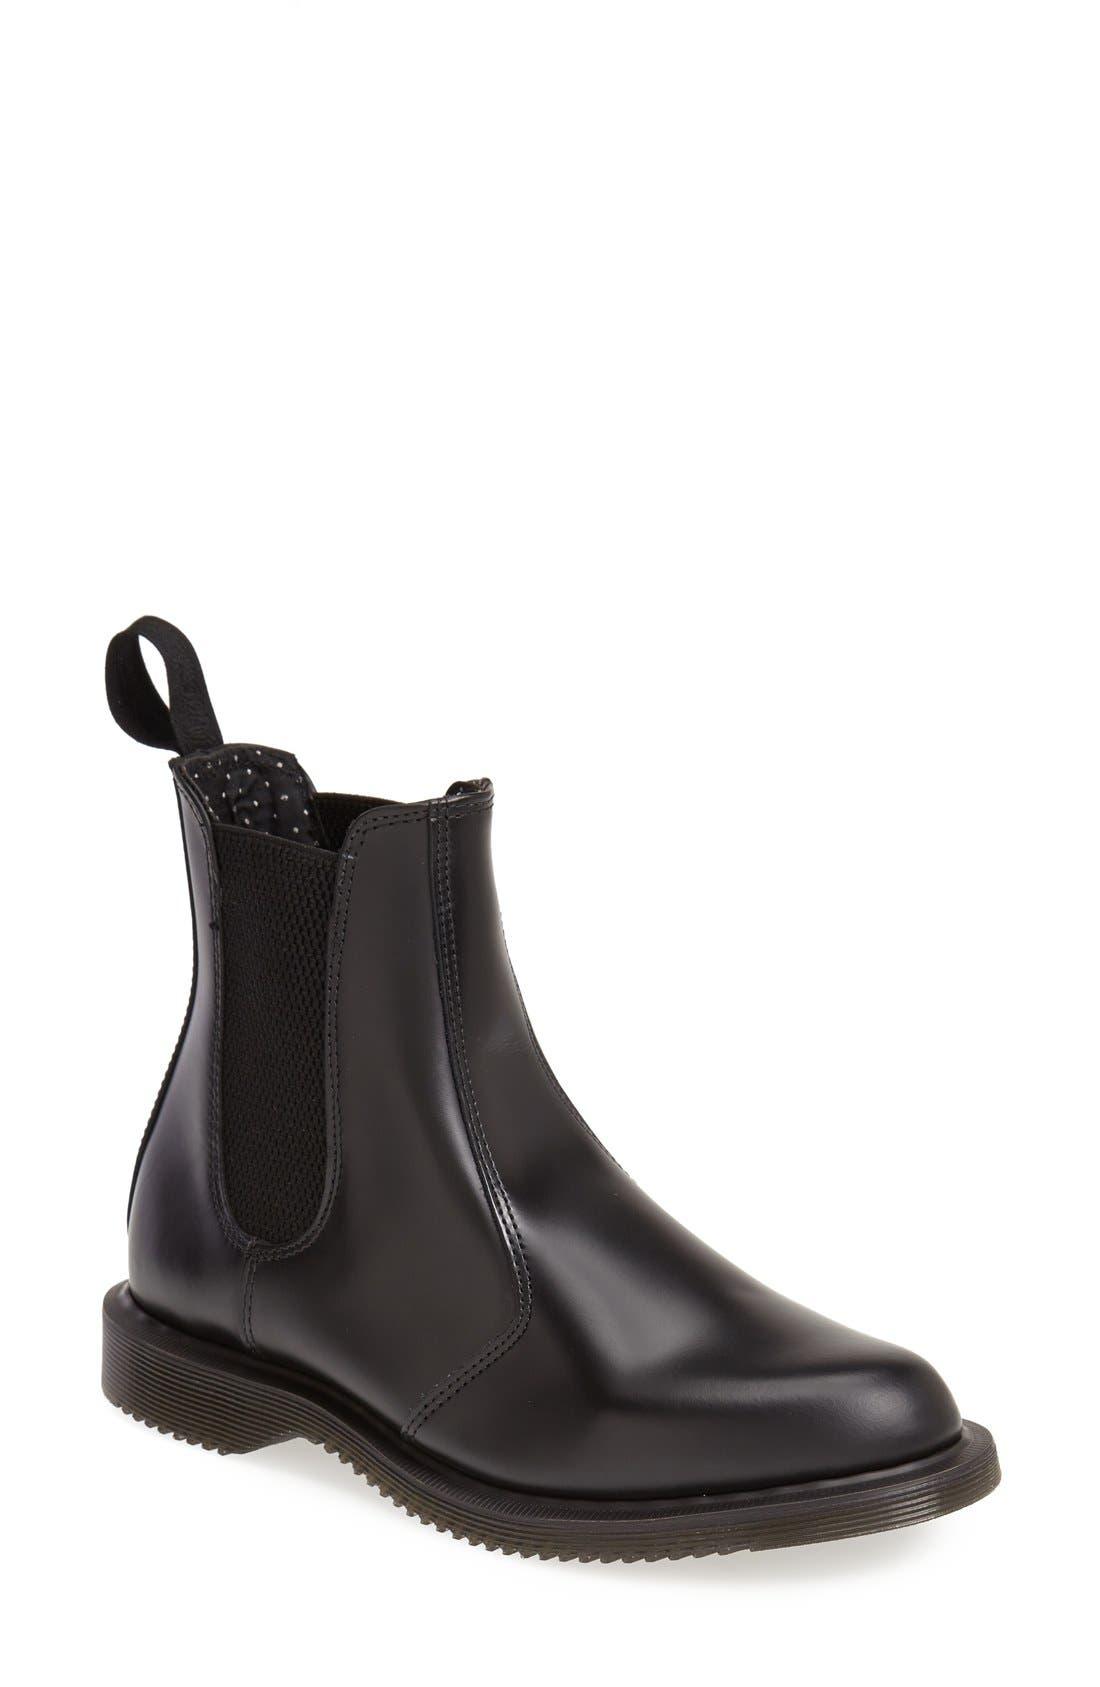 Main Image - Dr. Martens 'Flora' Chelsea Boot (Women)